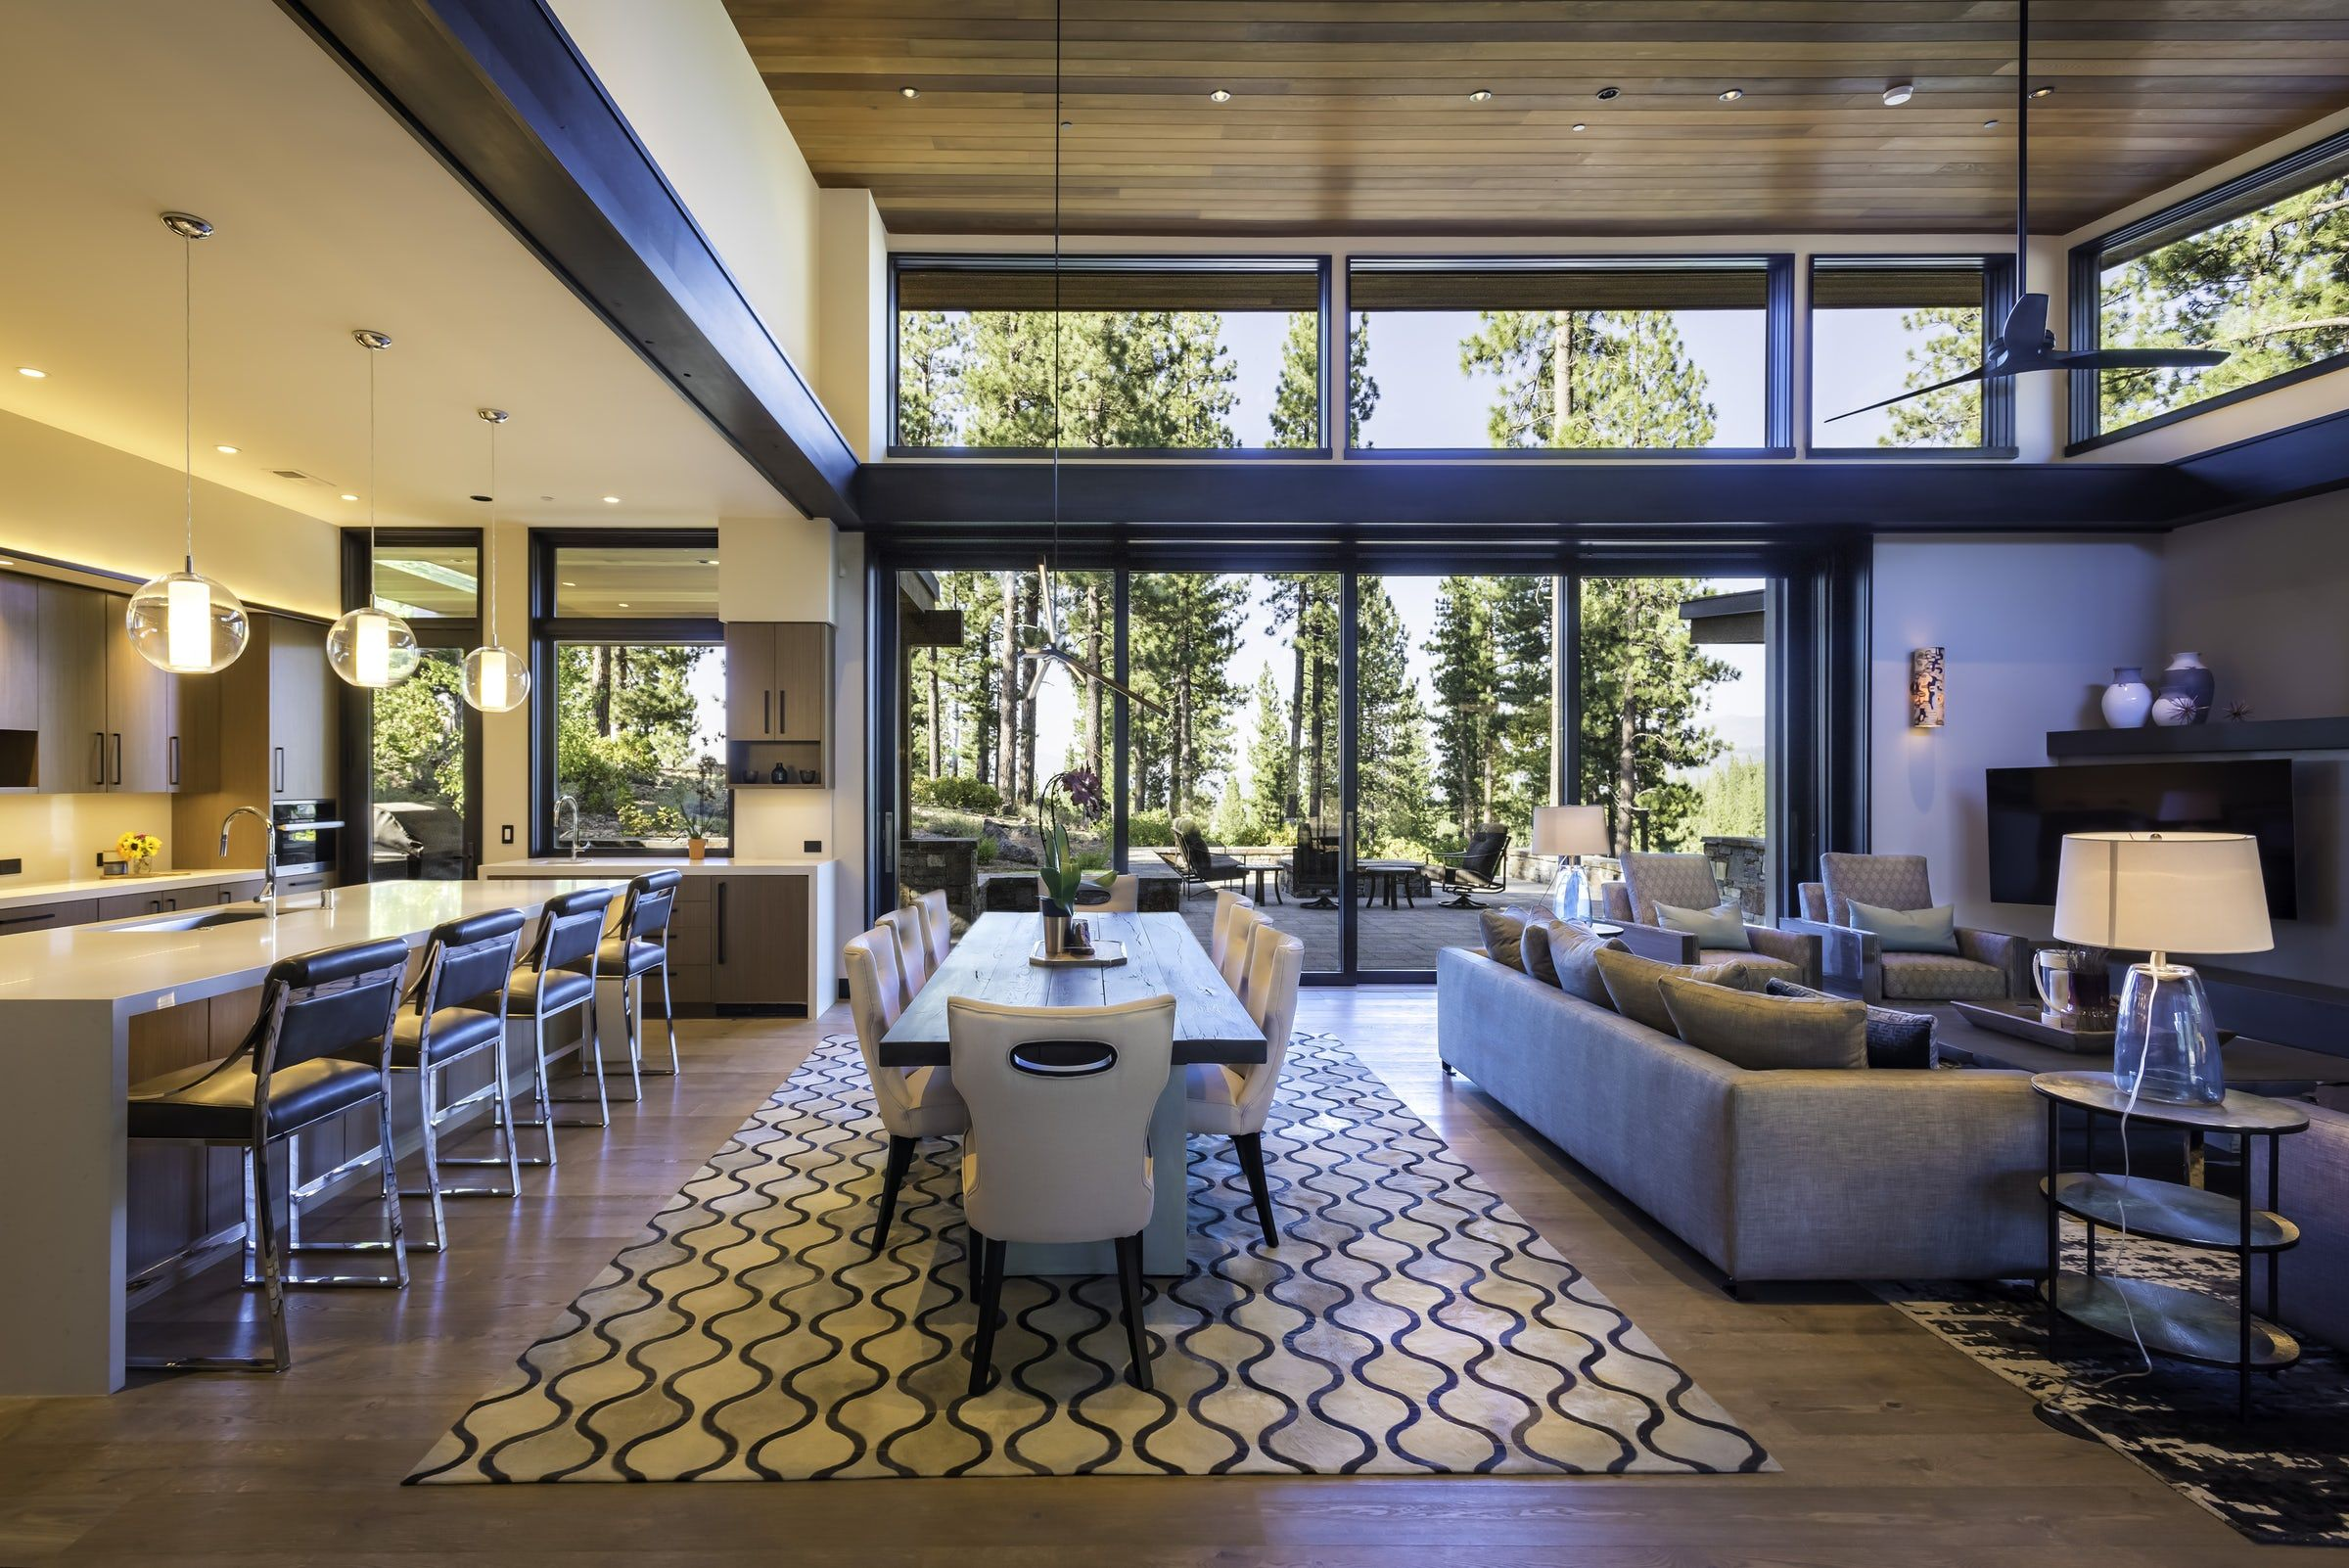 30+ Gorgeous Open Floor Plan Ideas , How to Design Open